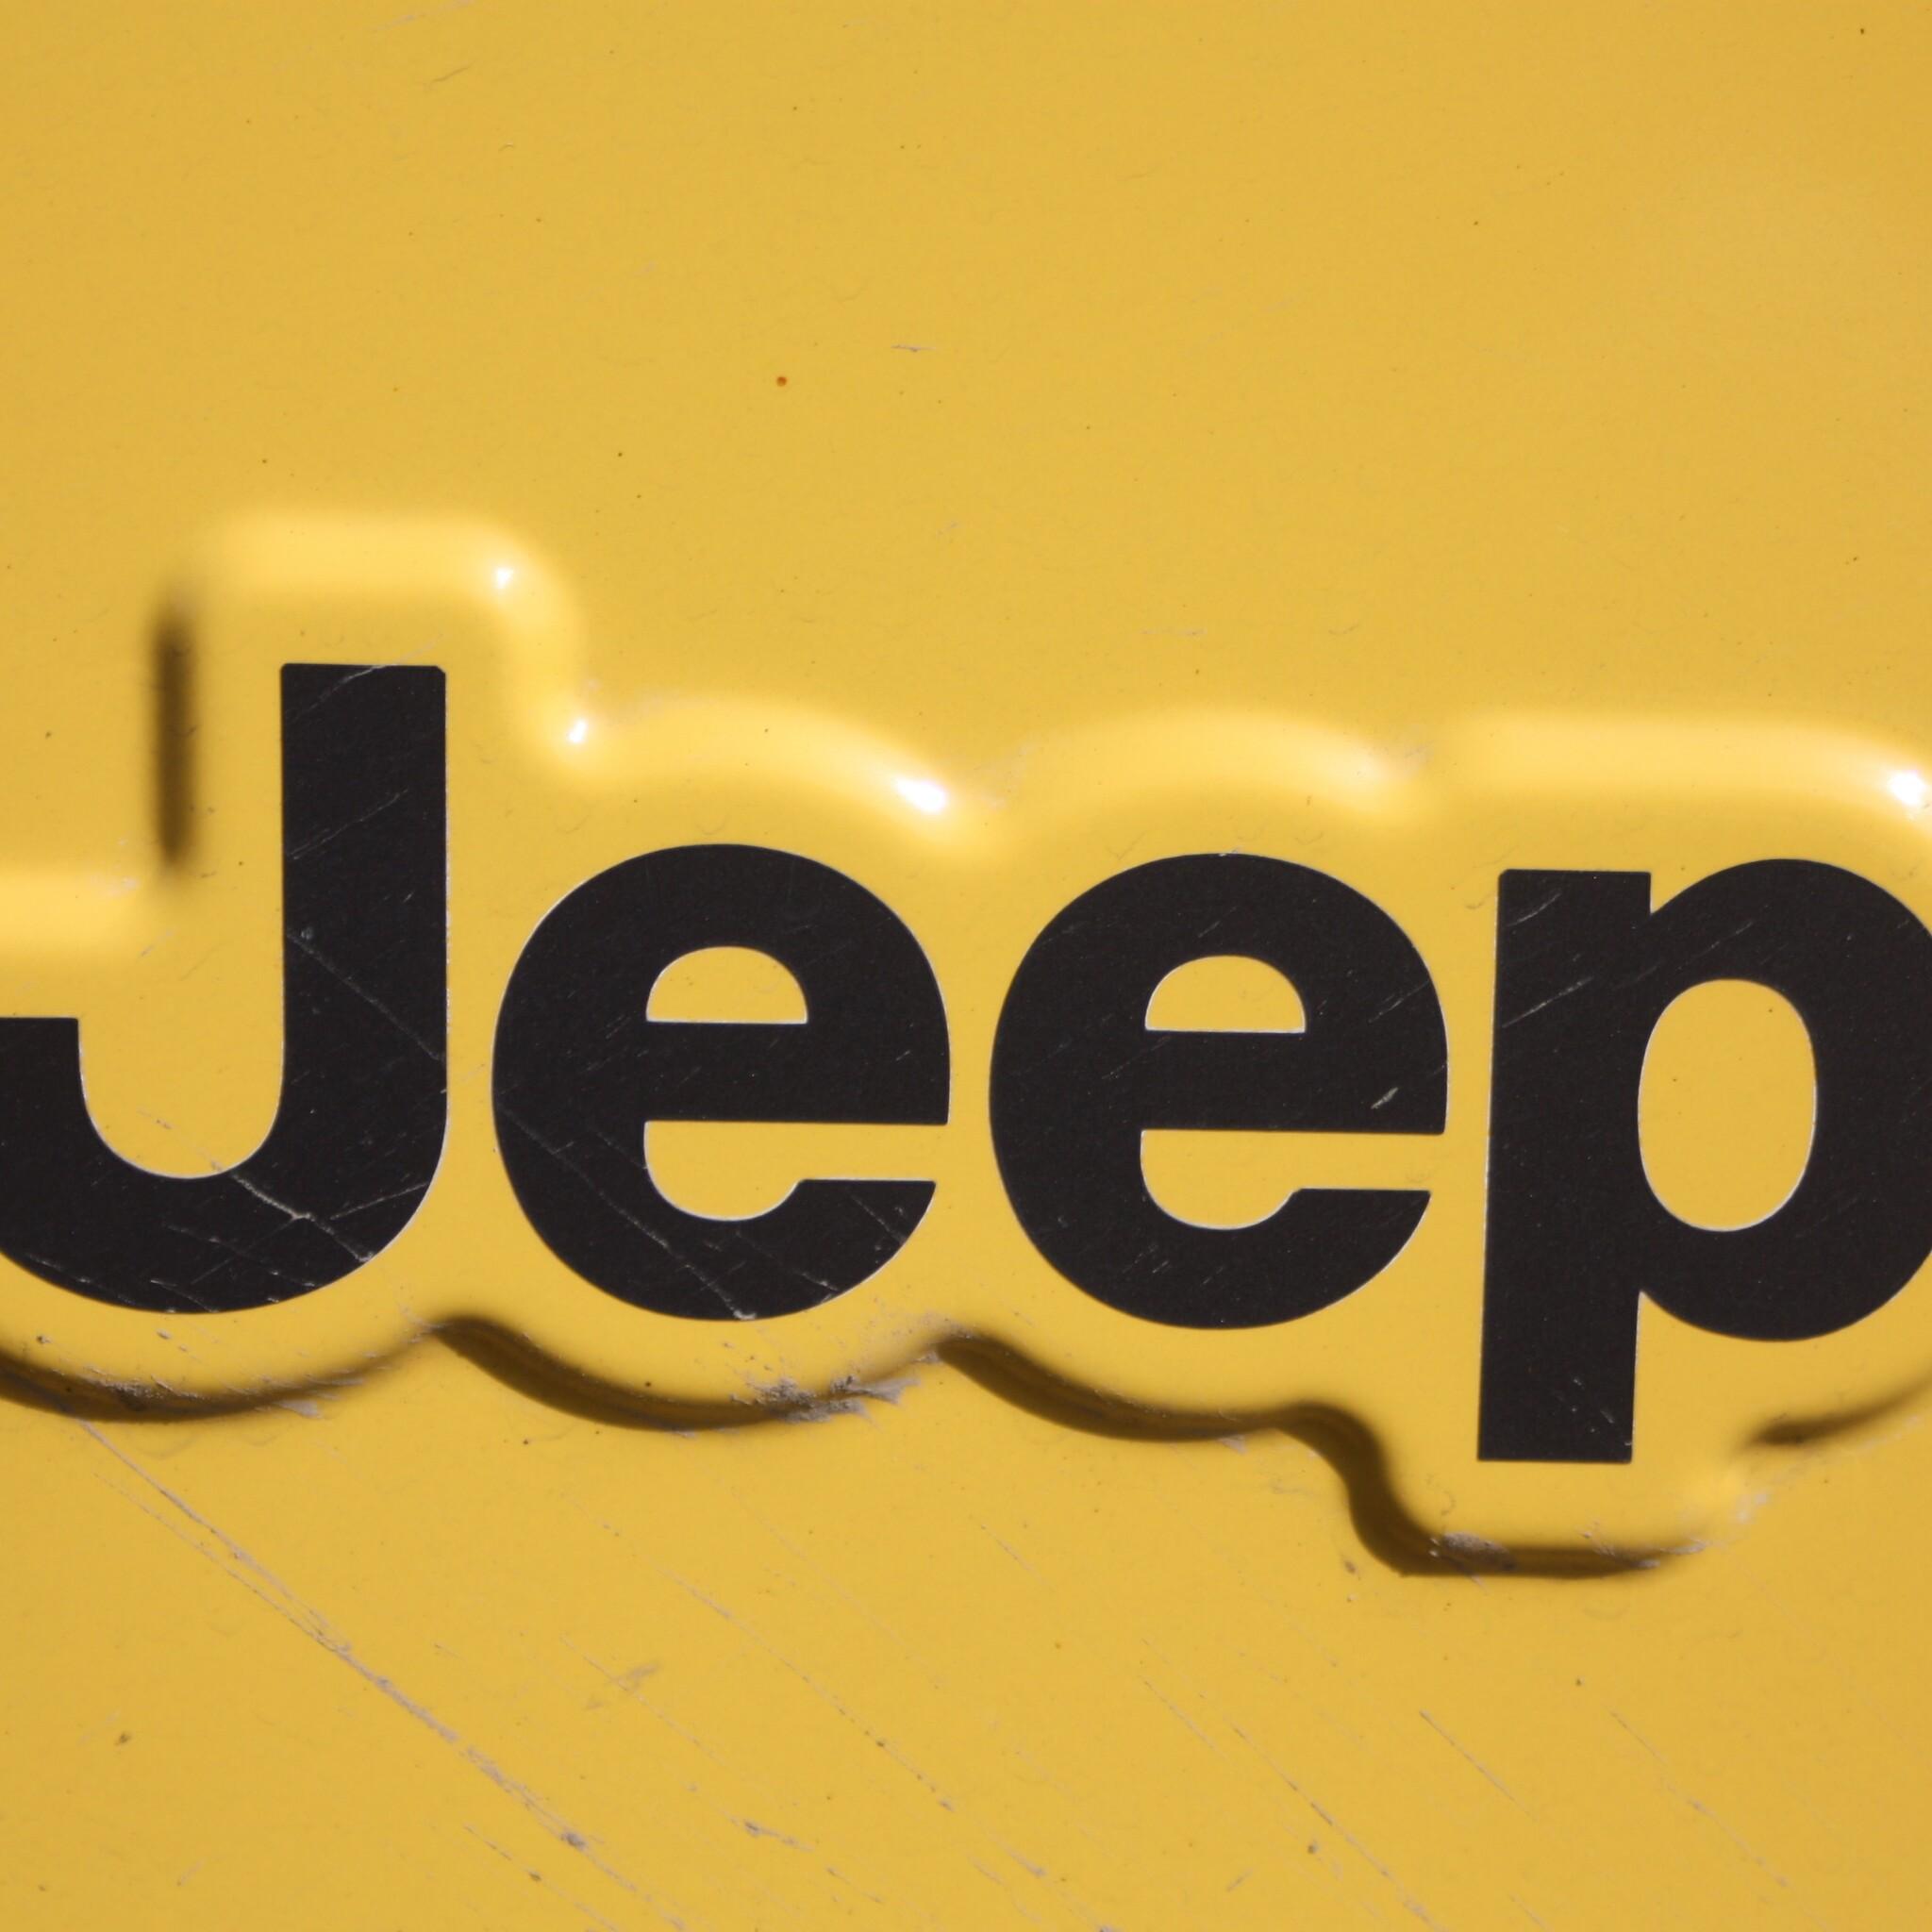 2048x2048 Jeep Logo Ipad Air HD 4k Wallpapers, Images